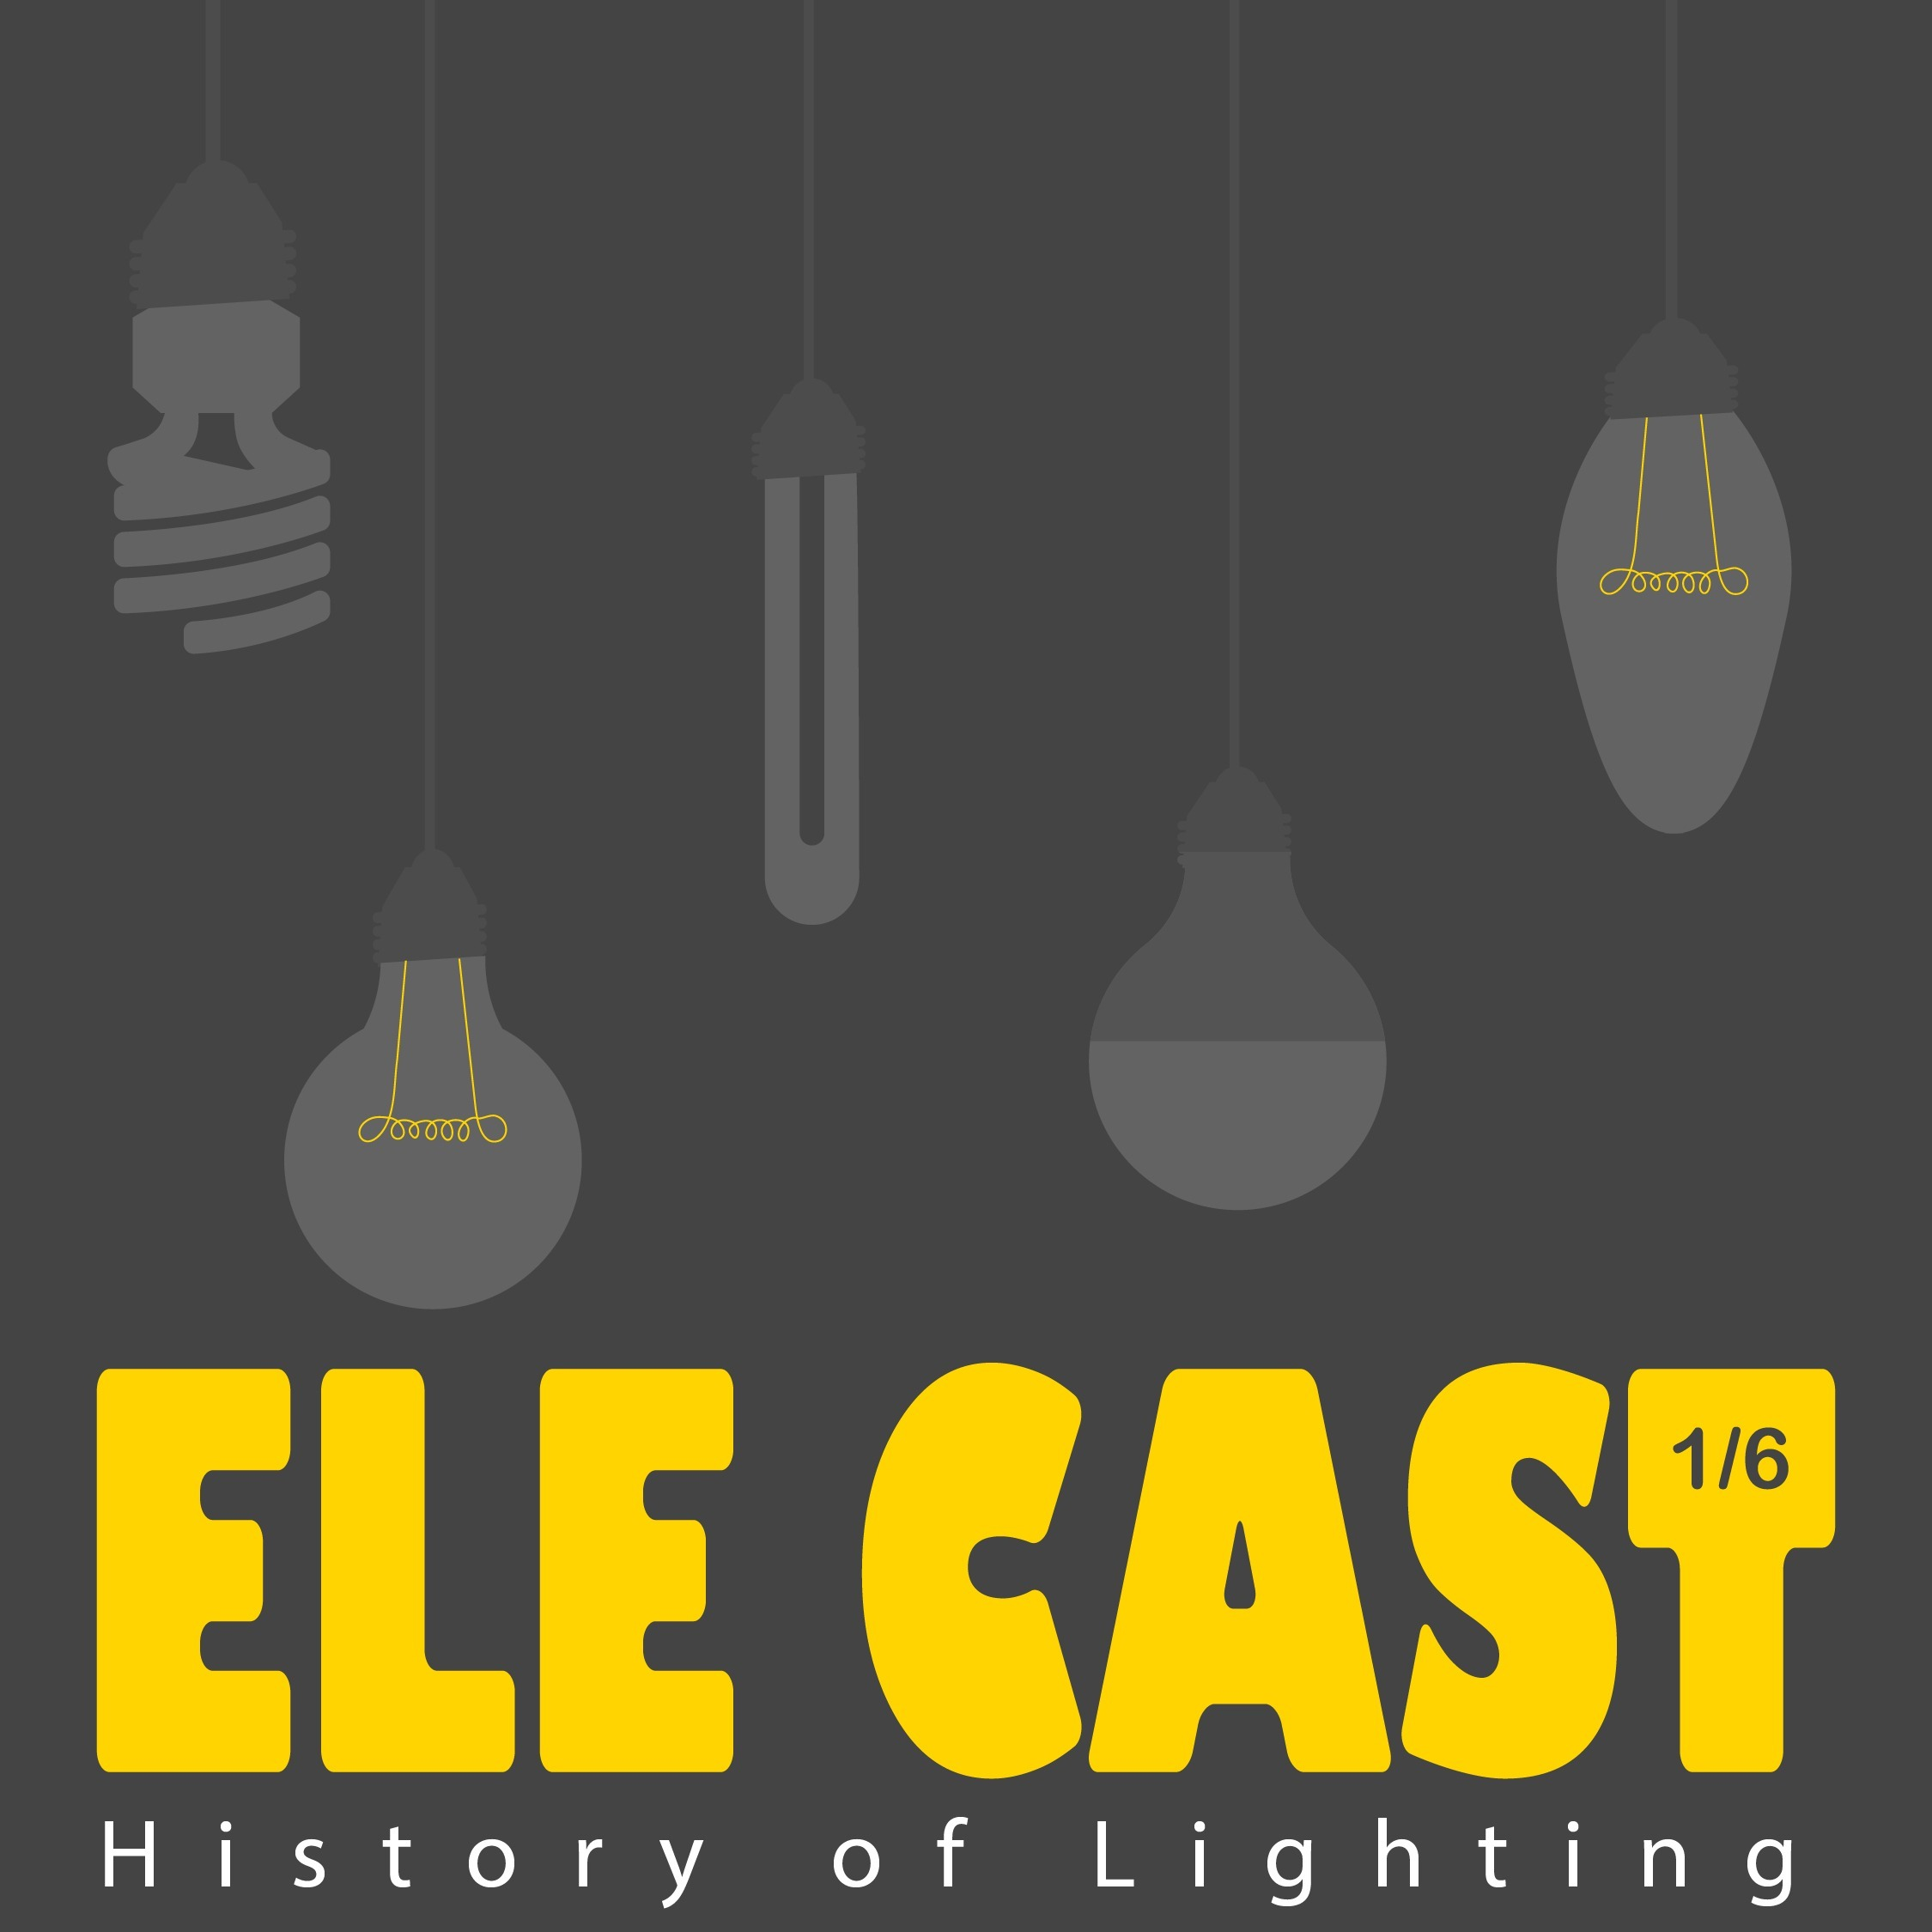 History of Lighting - تاریخچه روشنایی